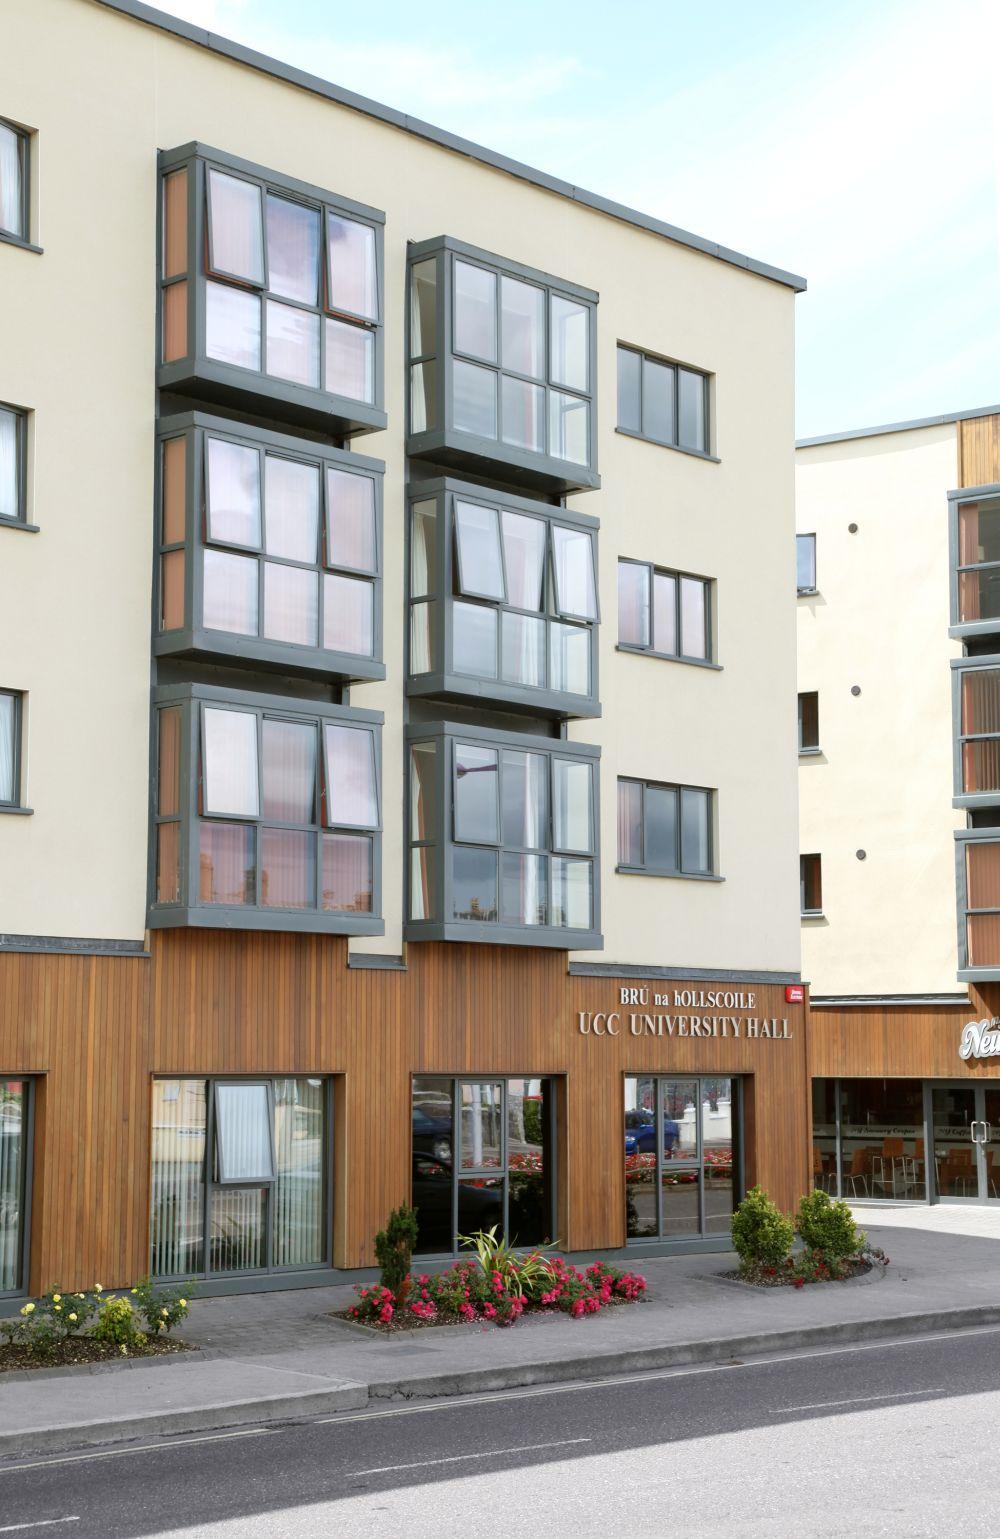 University hall cork university residence best price for 3 kitchener street leeds